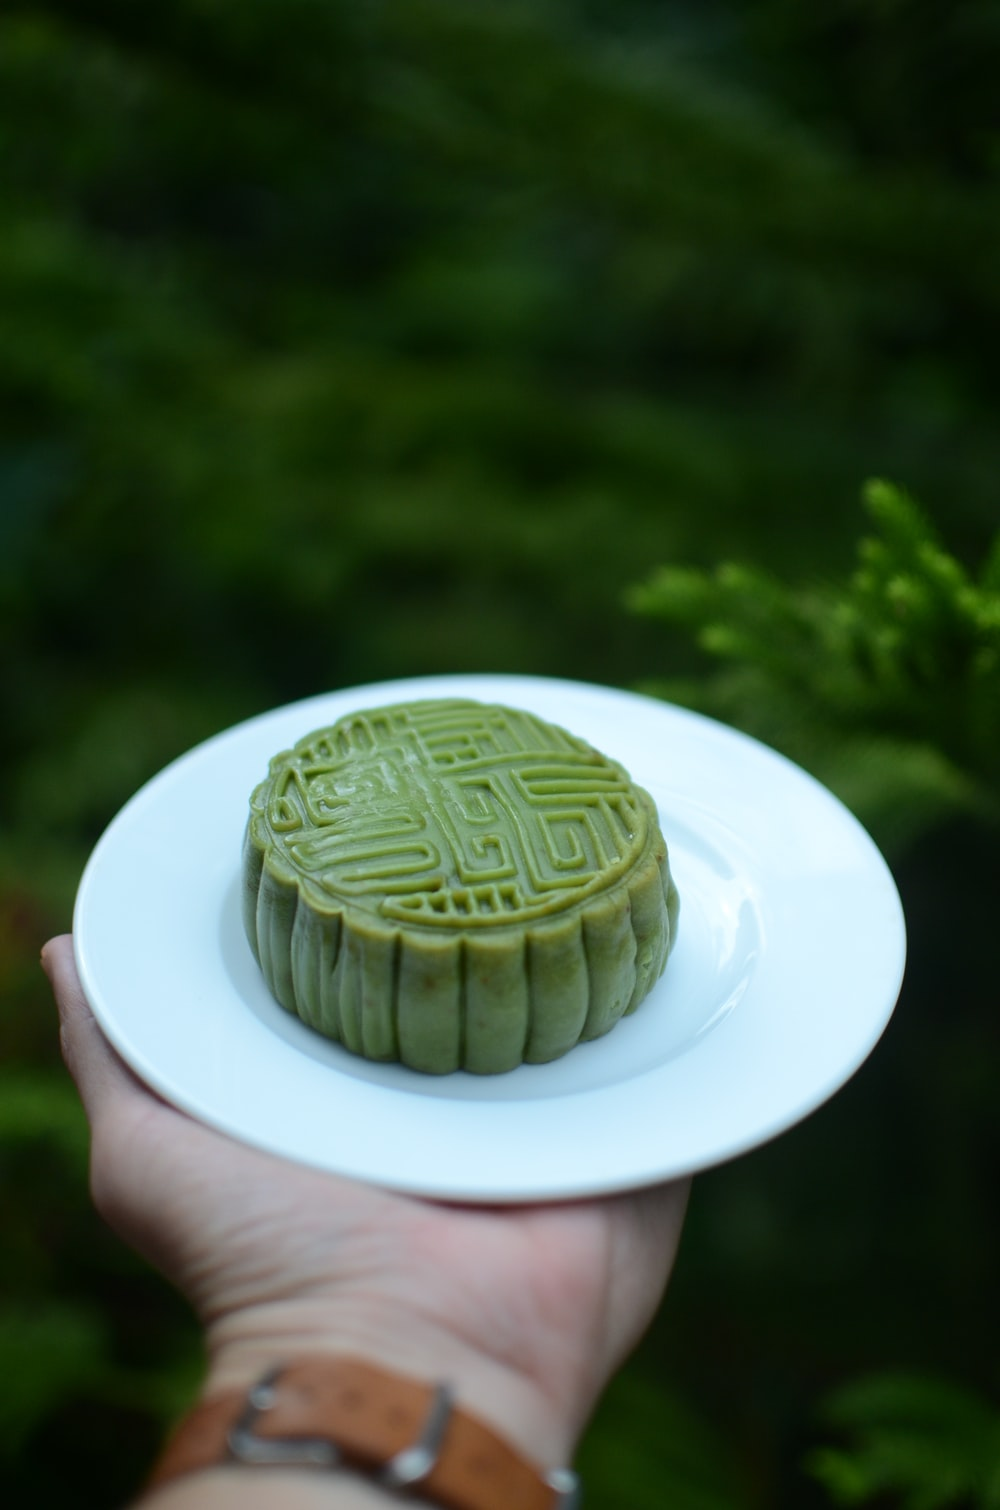 jelly cake on ceramic plate